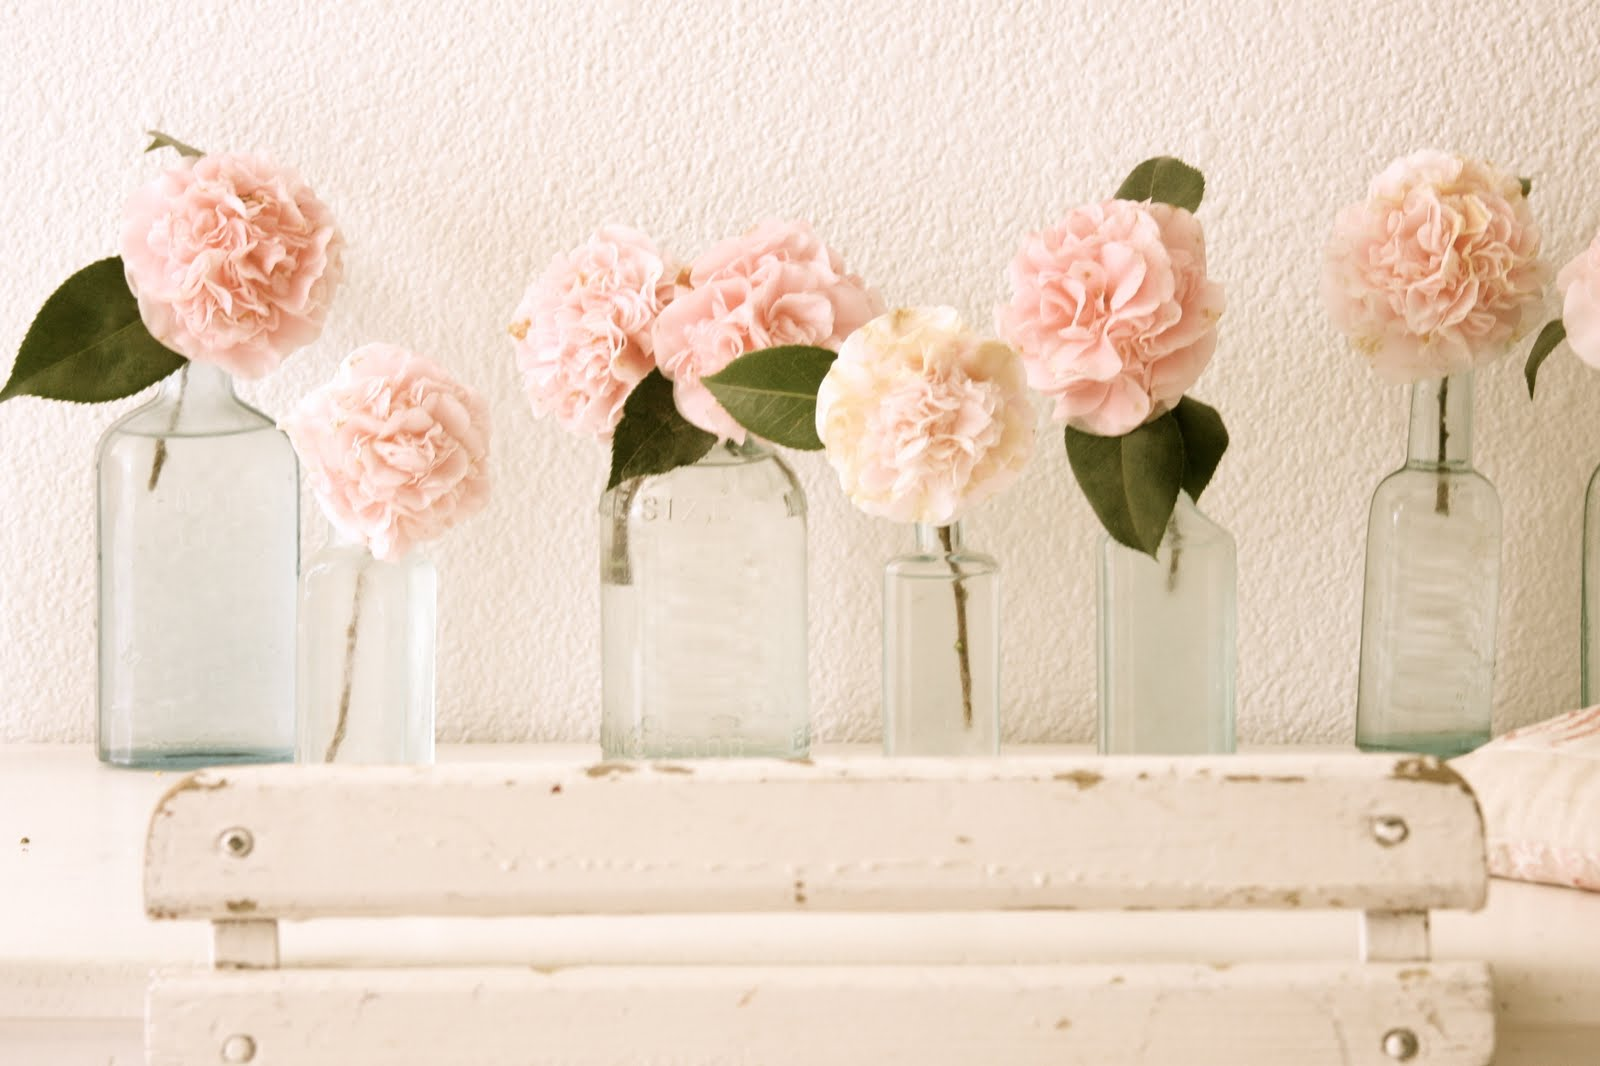 Vintage glass bottles centerpieces pink garden roses